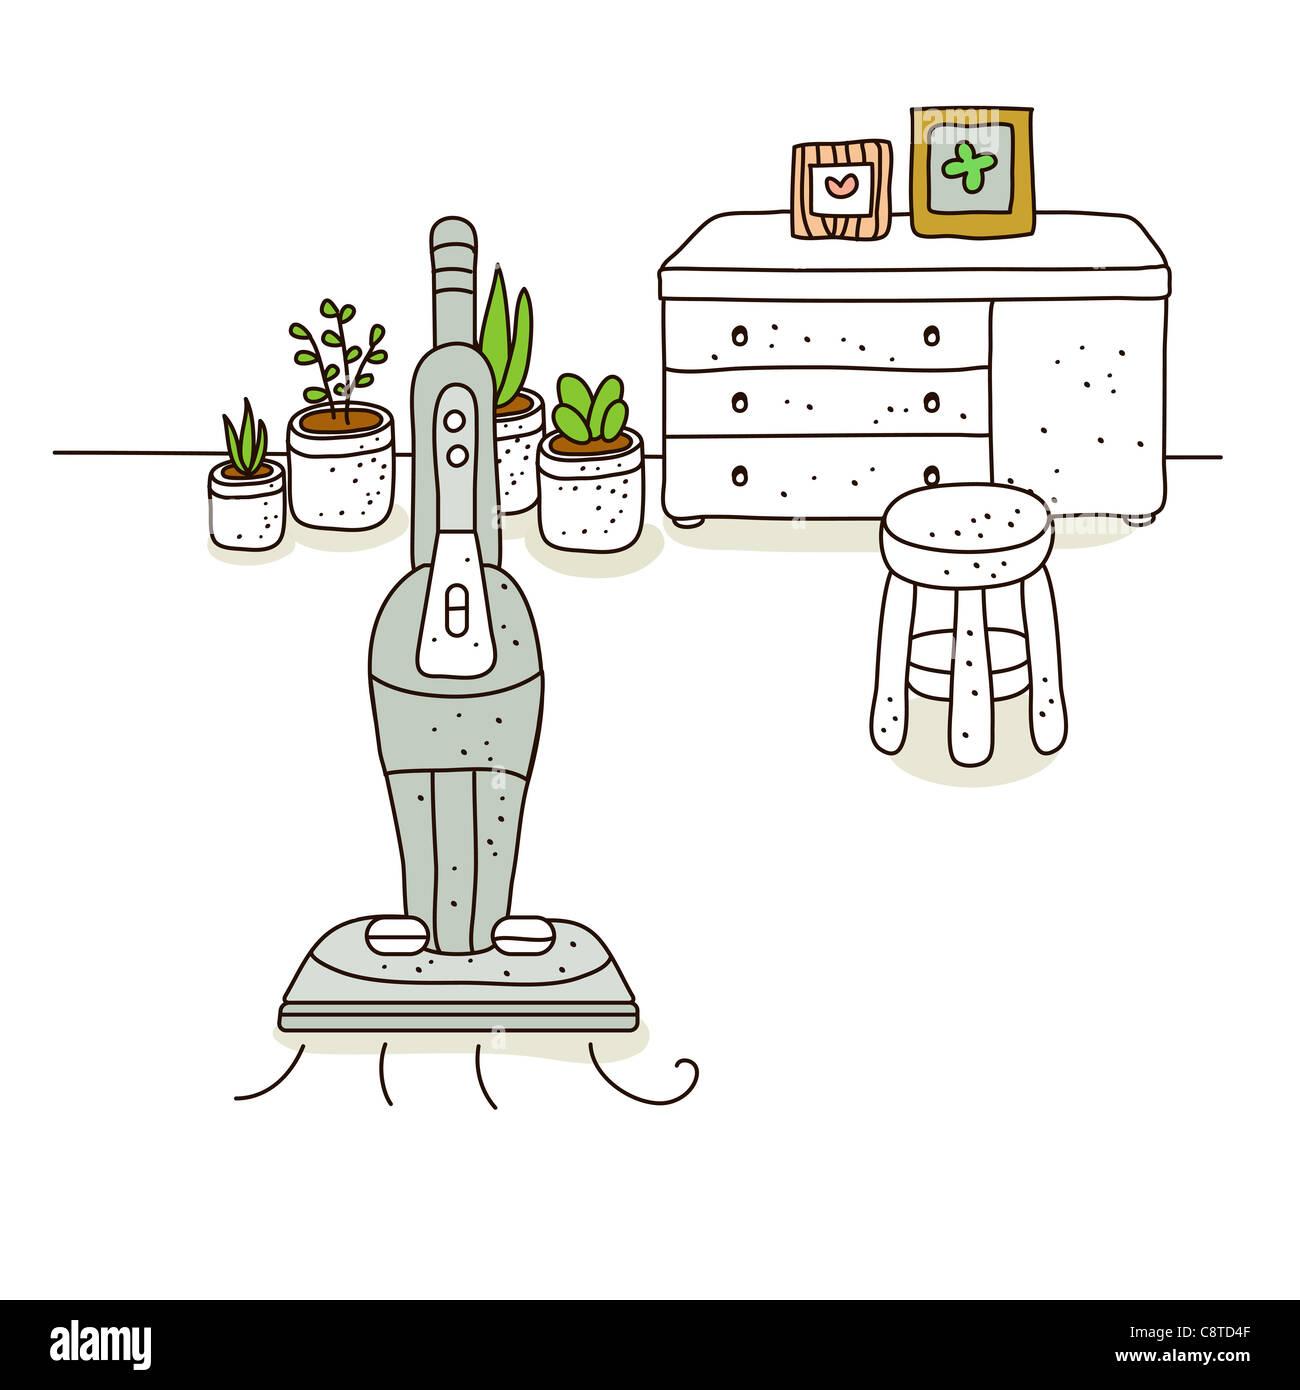 Illustration of vacuum cleaner - Stock Image